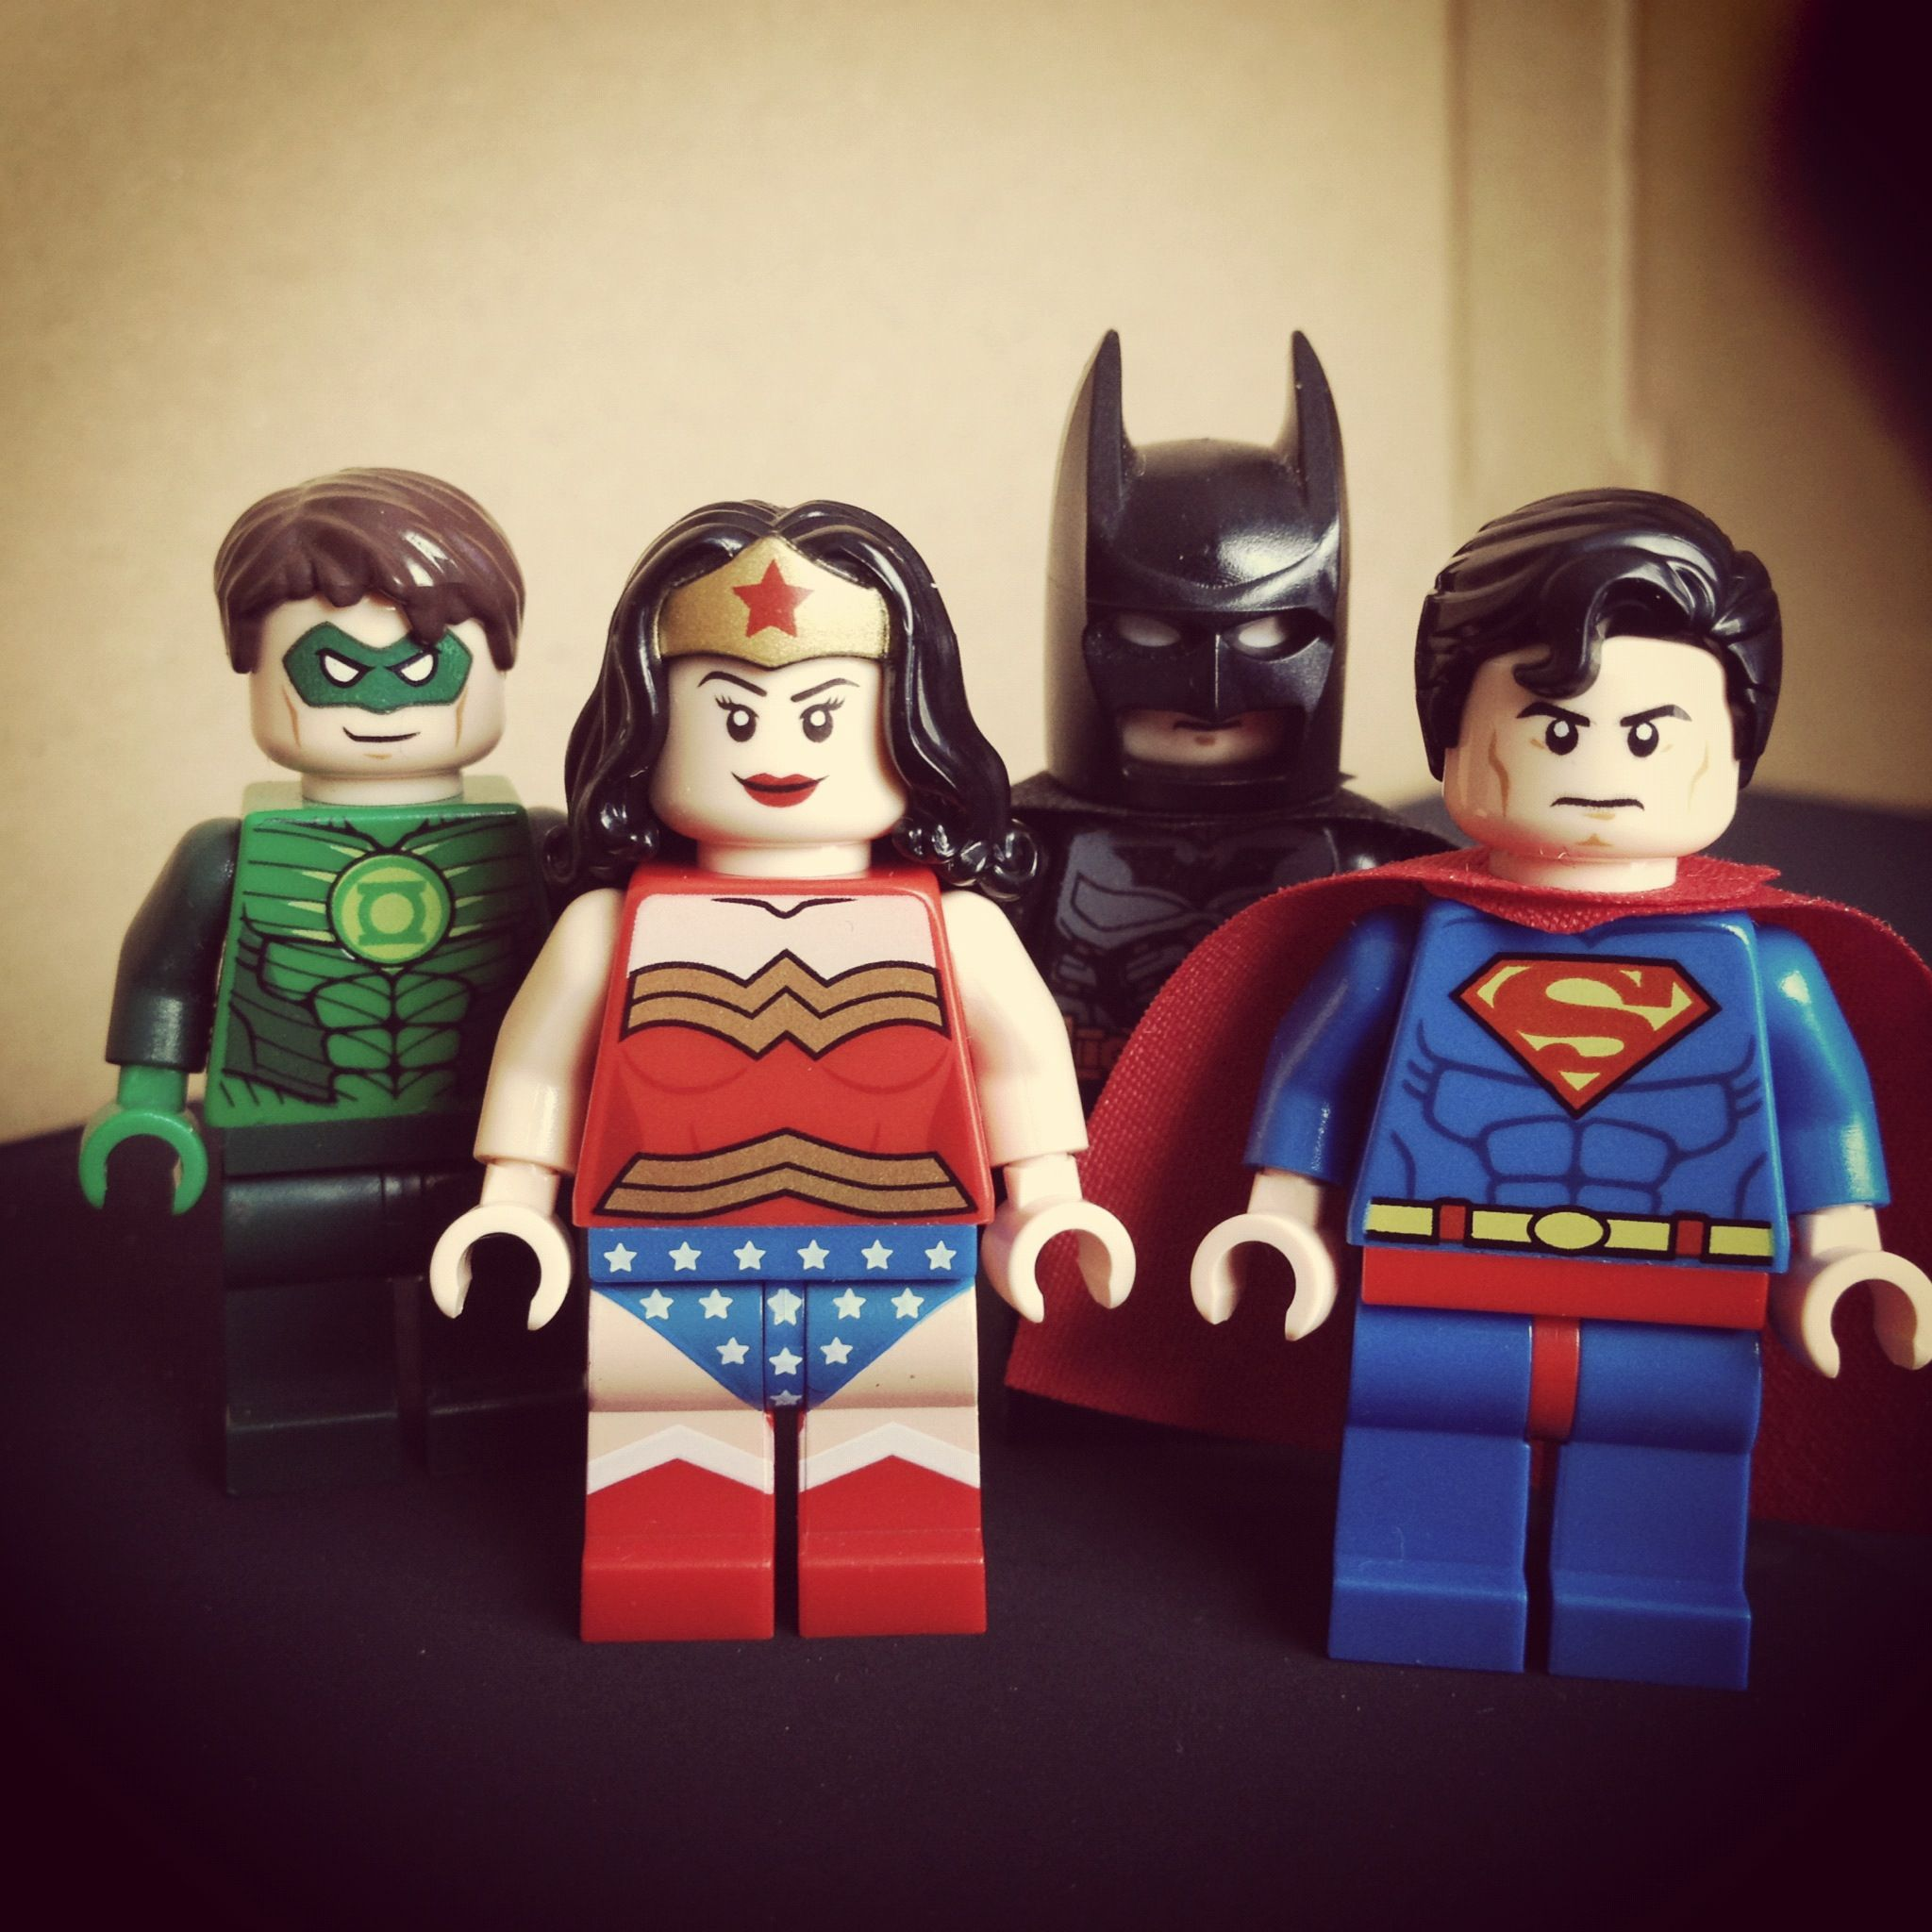 Lego Mini-Figure Batman Series 2 #10 Vacation Alfred